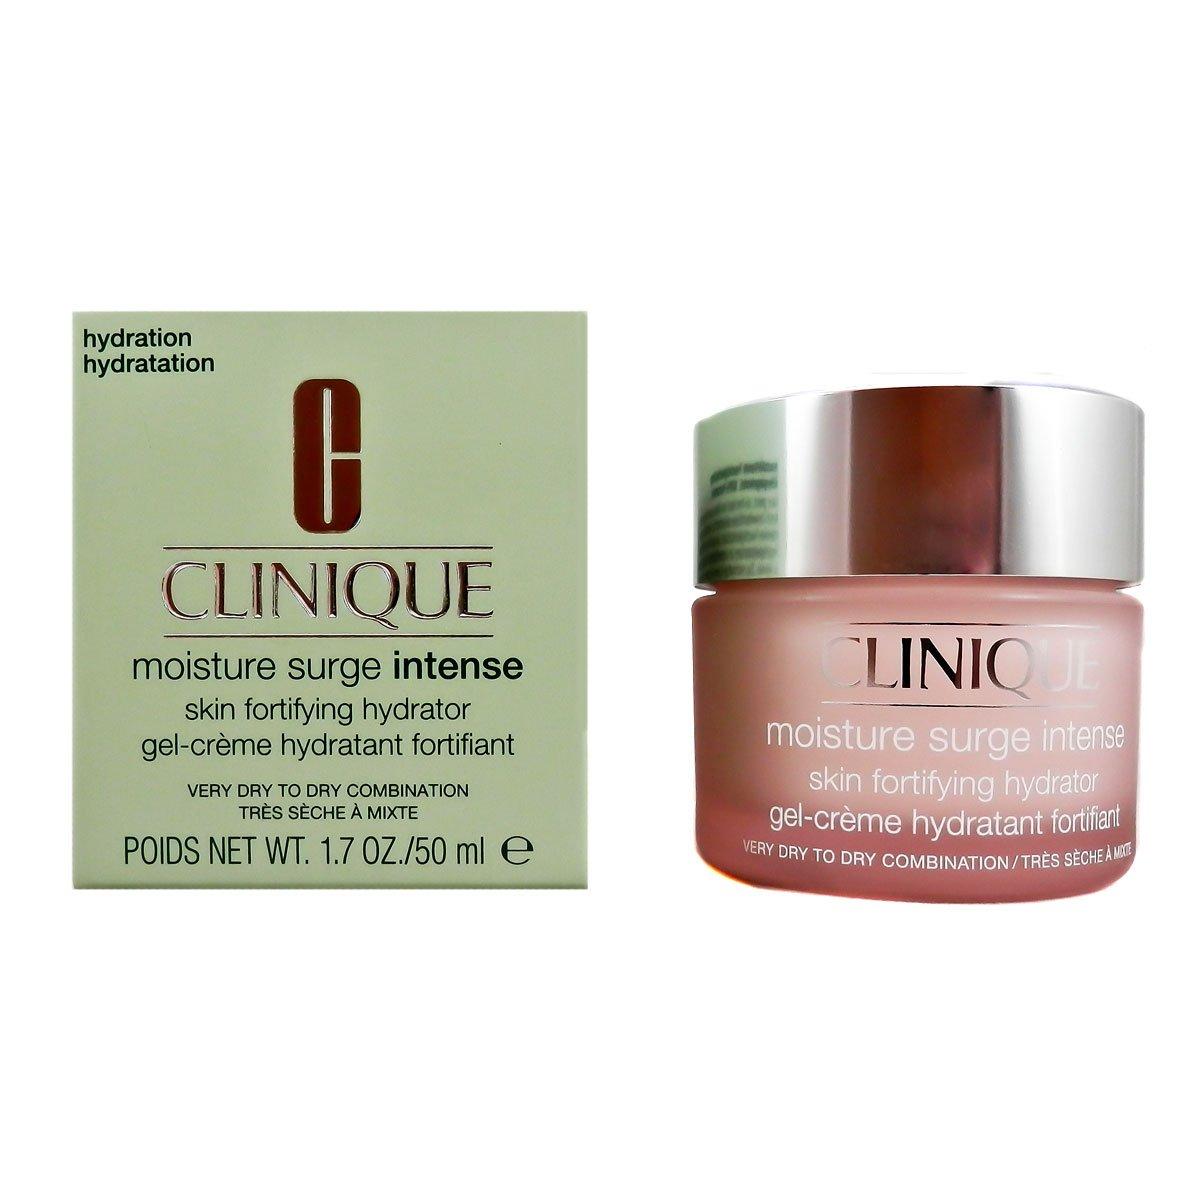 Clinique Moisture Surge Intense Skin Fortifying Hydrator 50 ml £20 @ Amazon